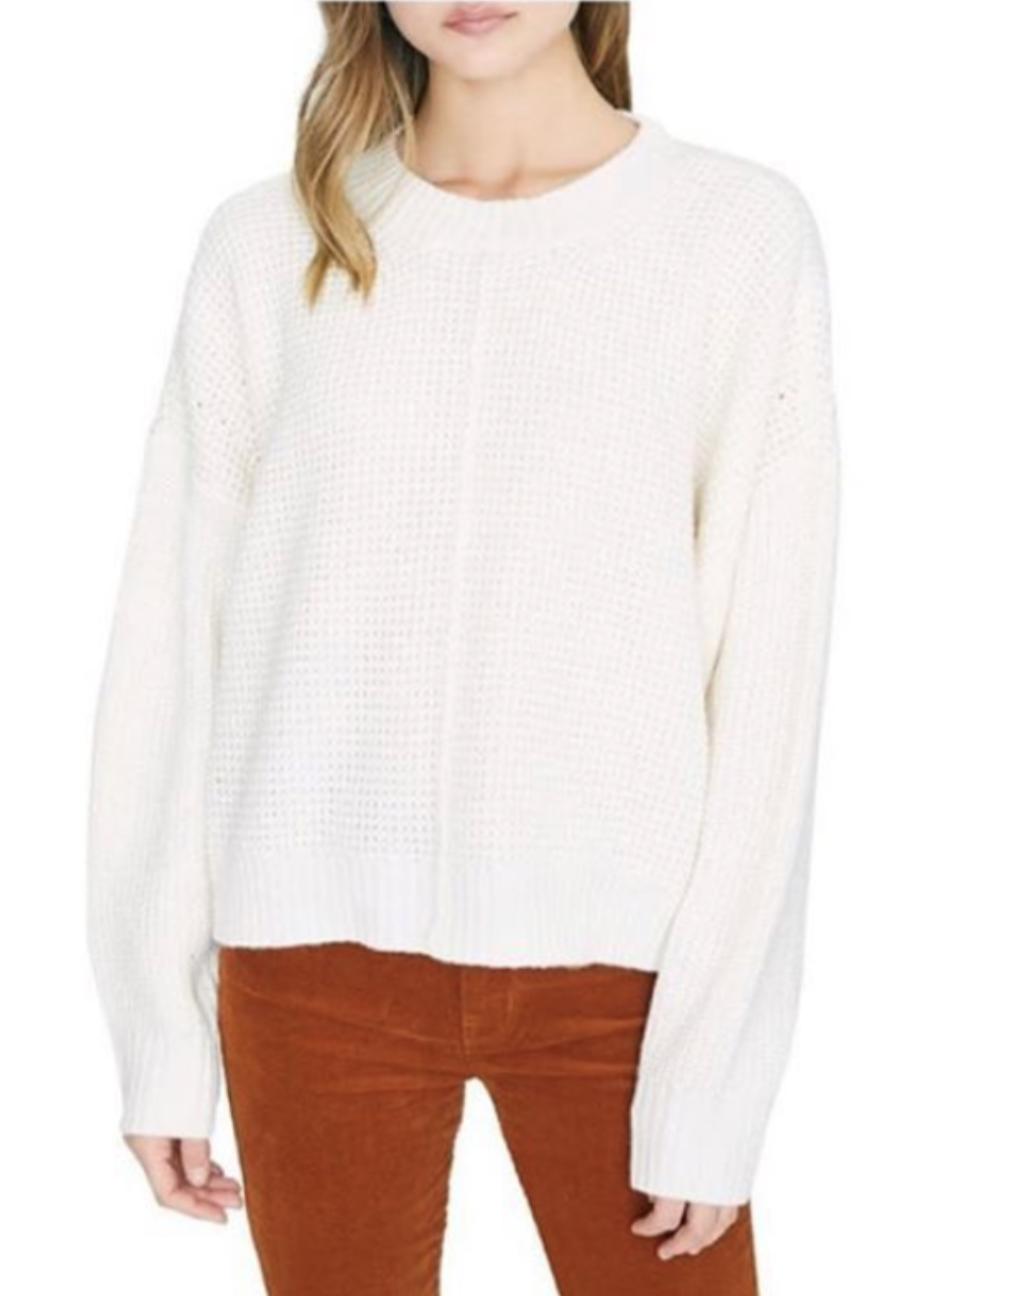 Moonstone Knit Sweater